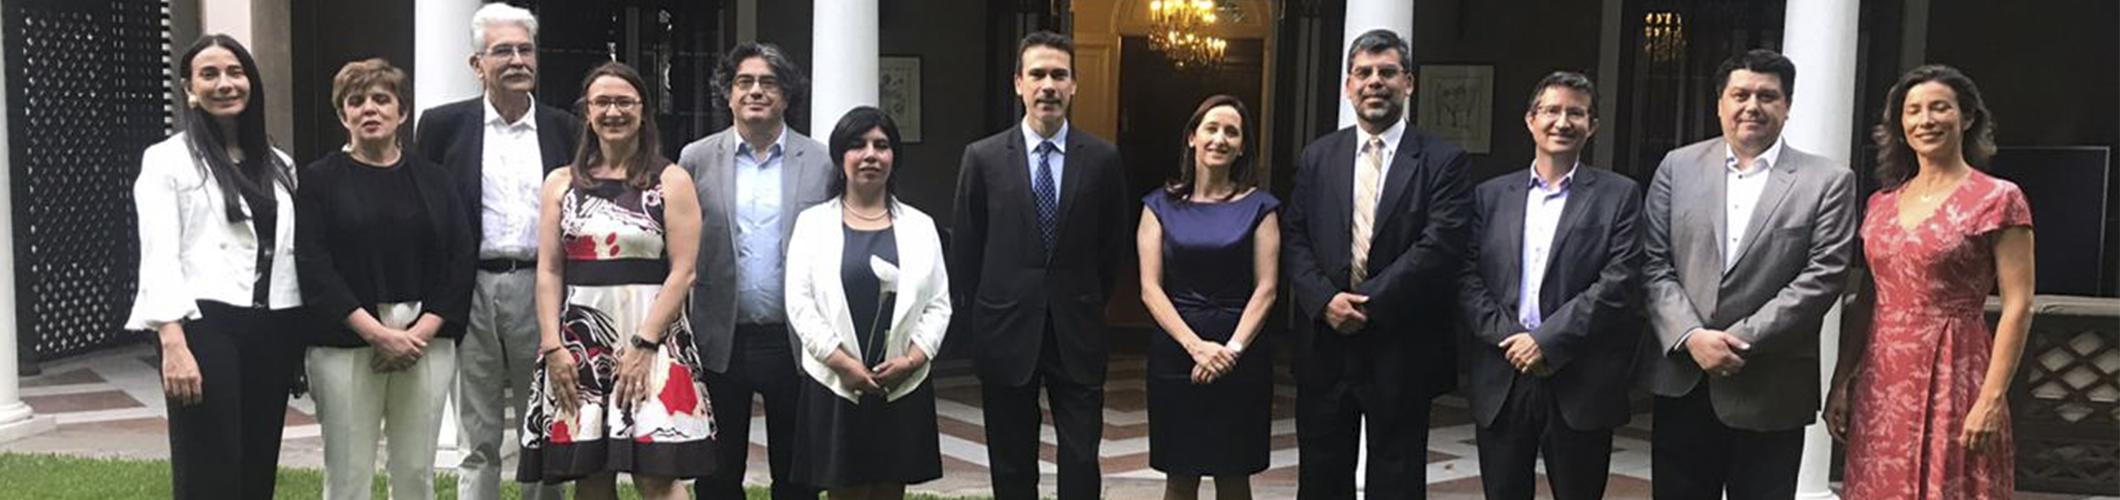 acto-embajada-chile-2019